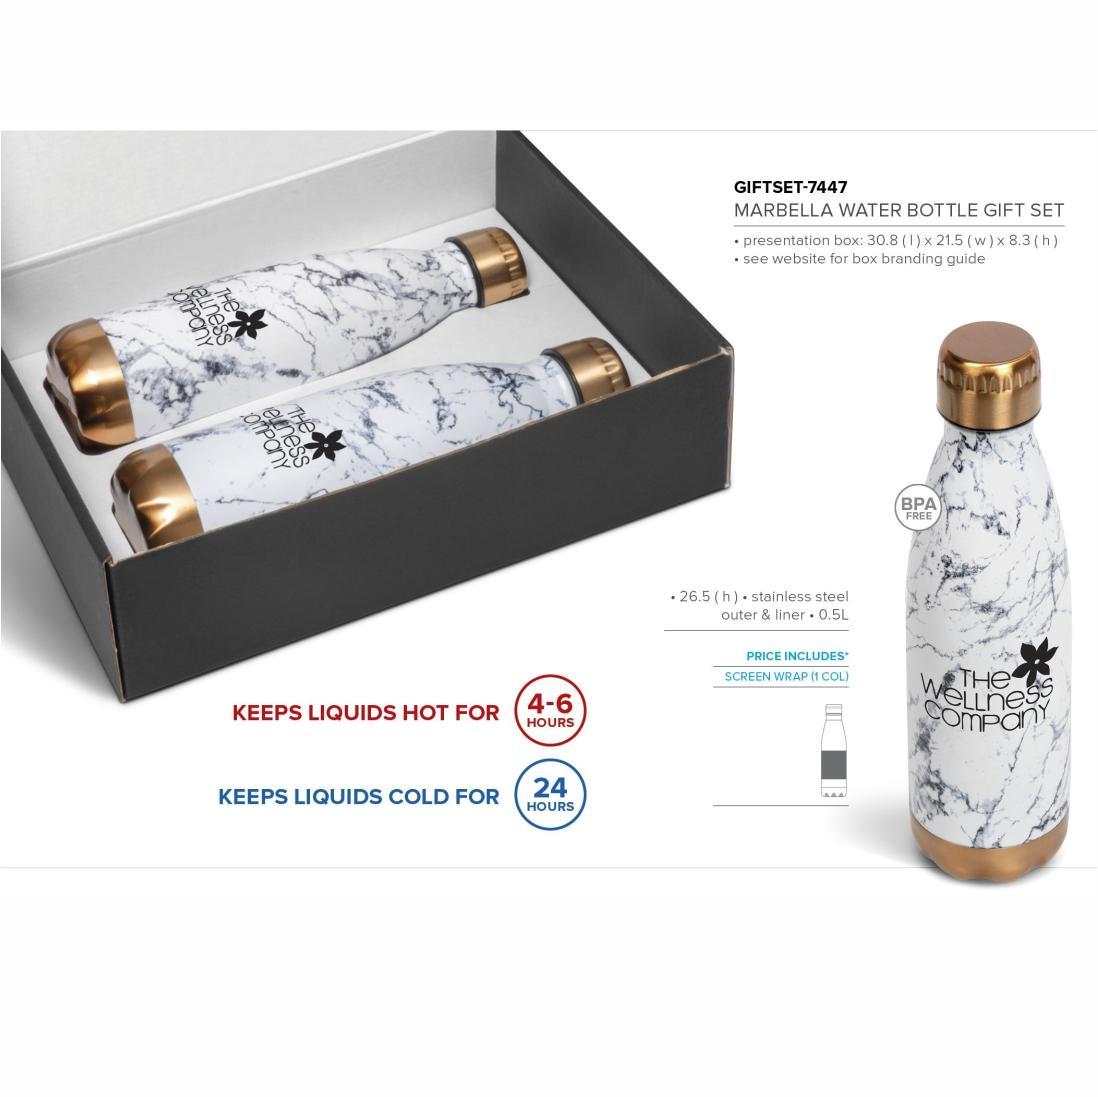 Marbella Water Bottle Gift Set - Bronze Only